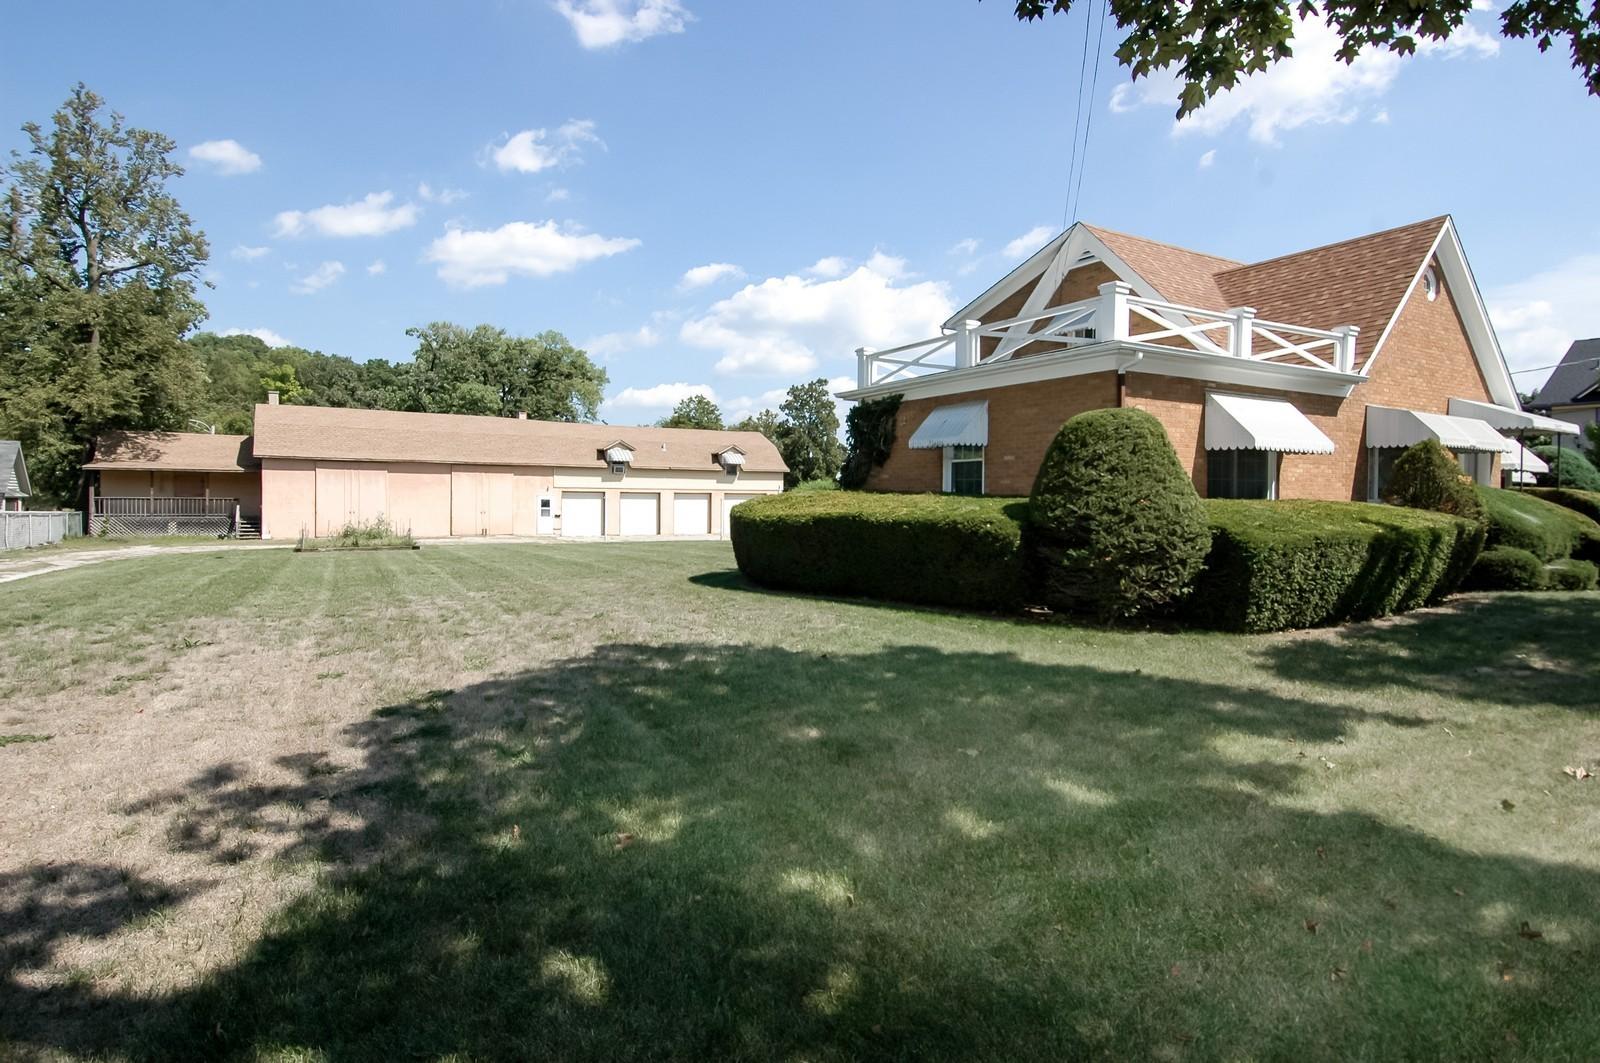 Real Estate Photography - 302 Washington, Algonquin, IL, 60102 - Side Yard